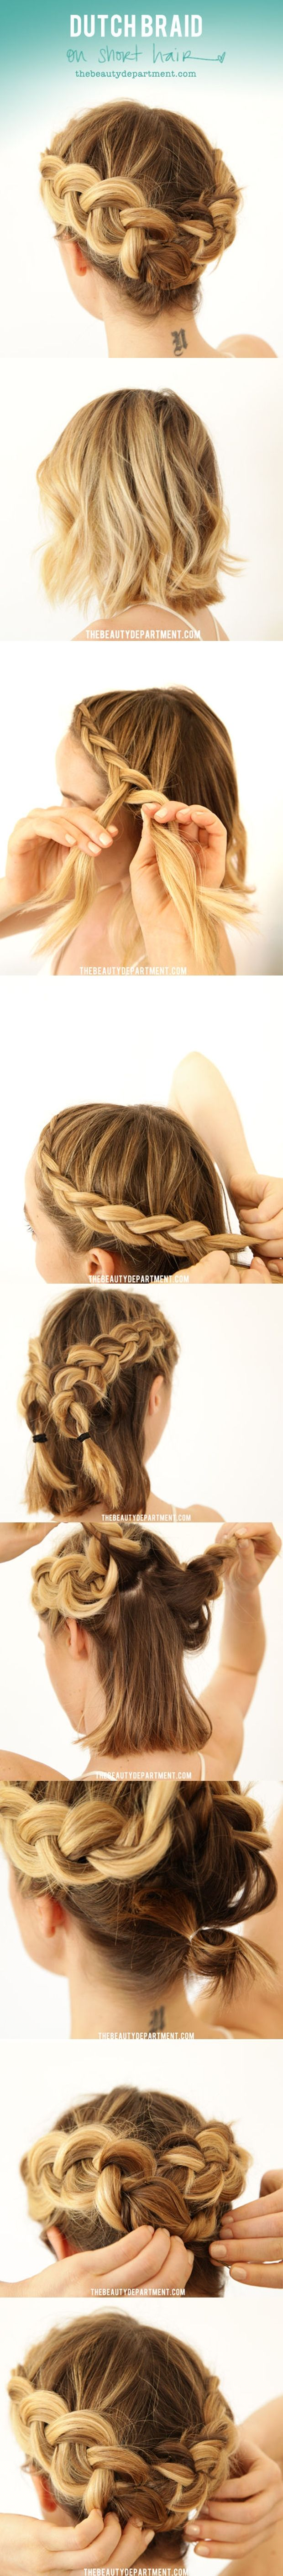 best cabello y peinados images on pinterest hair ideas hair